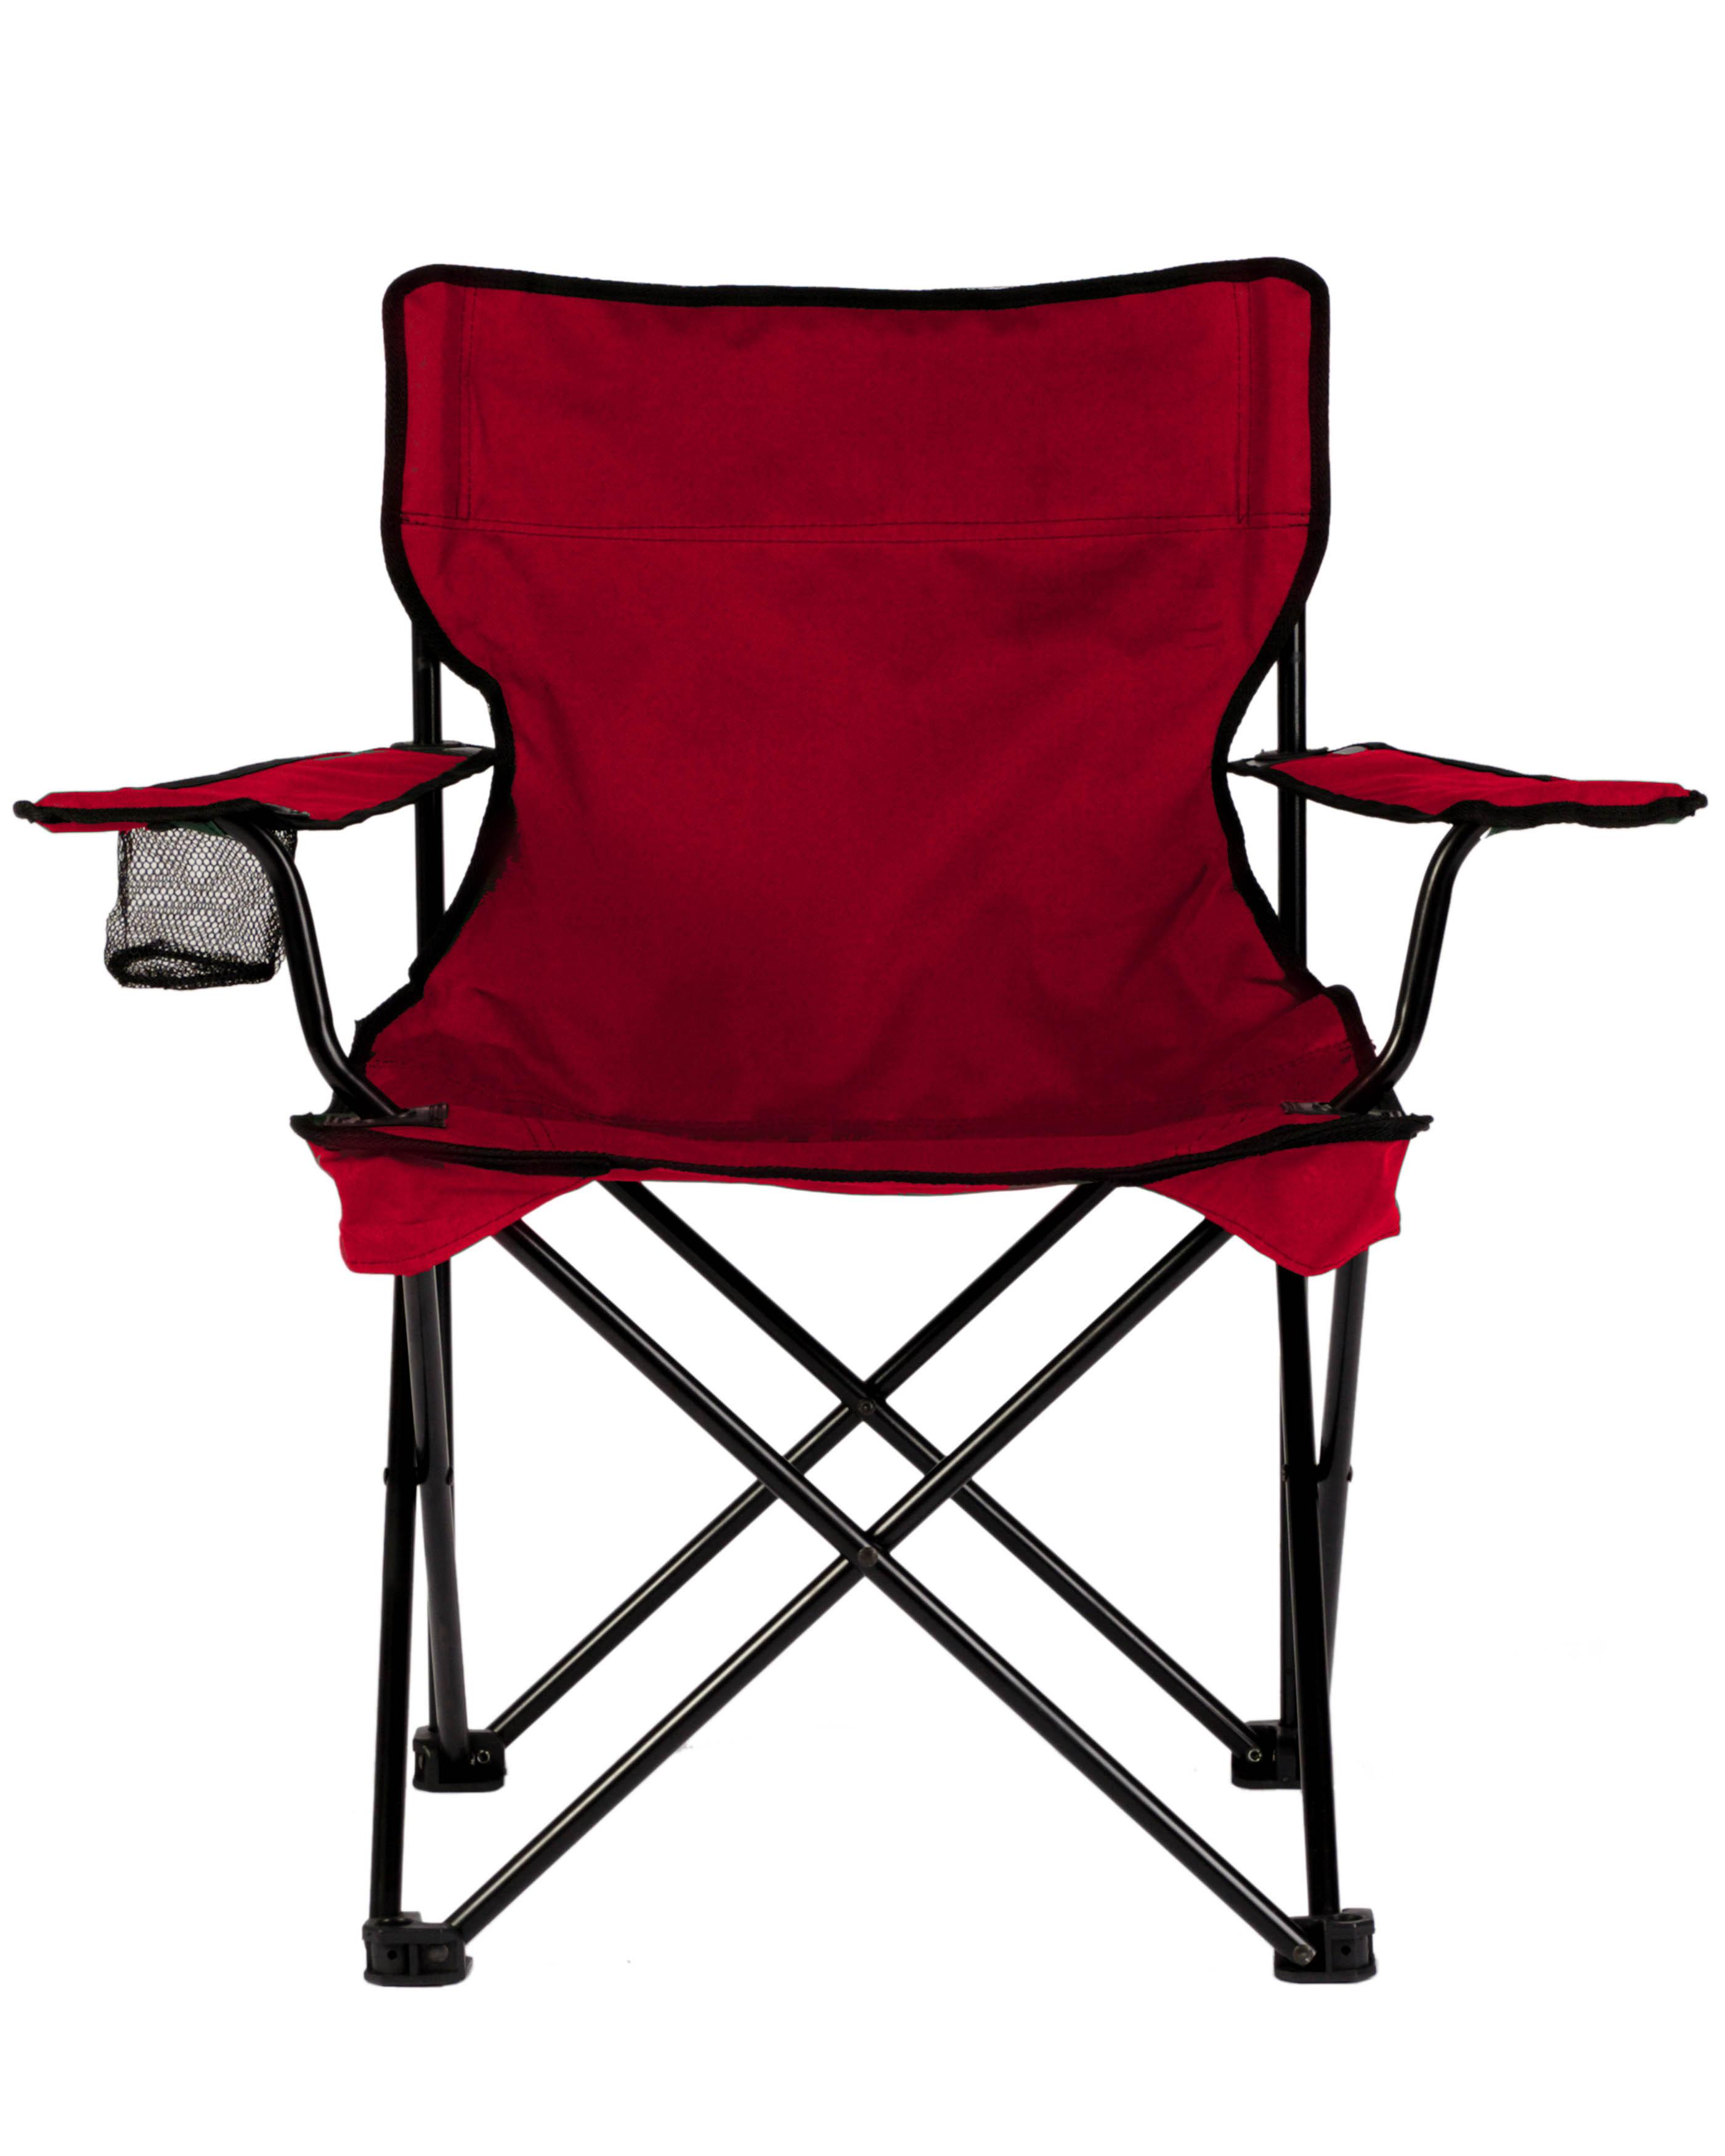 TravelChair C Series Rider Folding Camp Chair